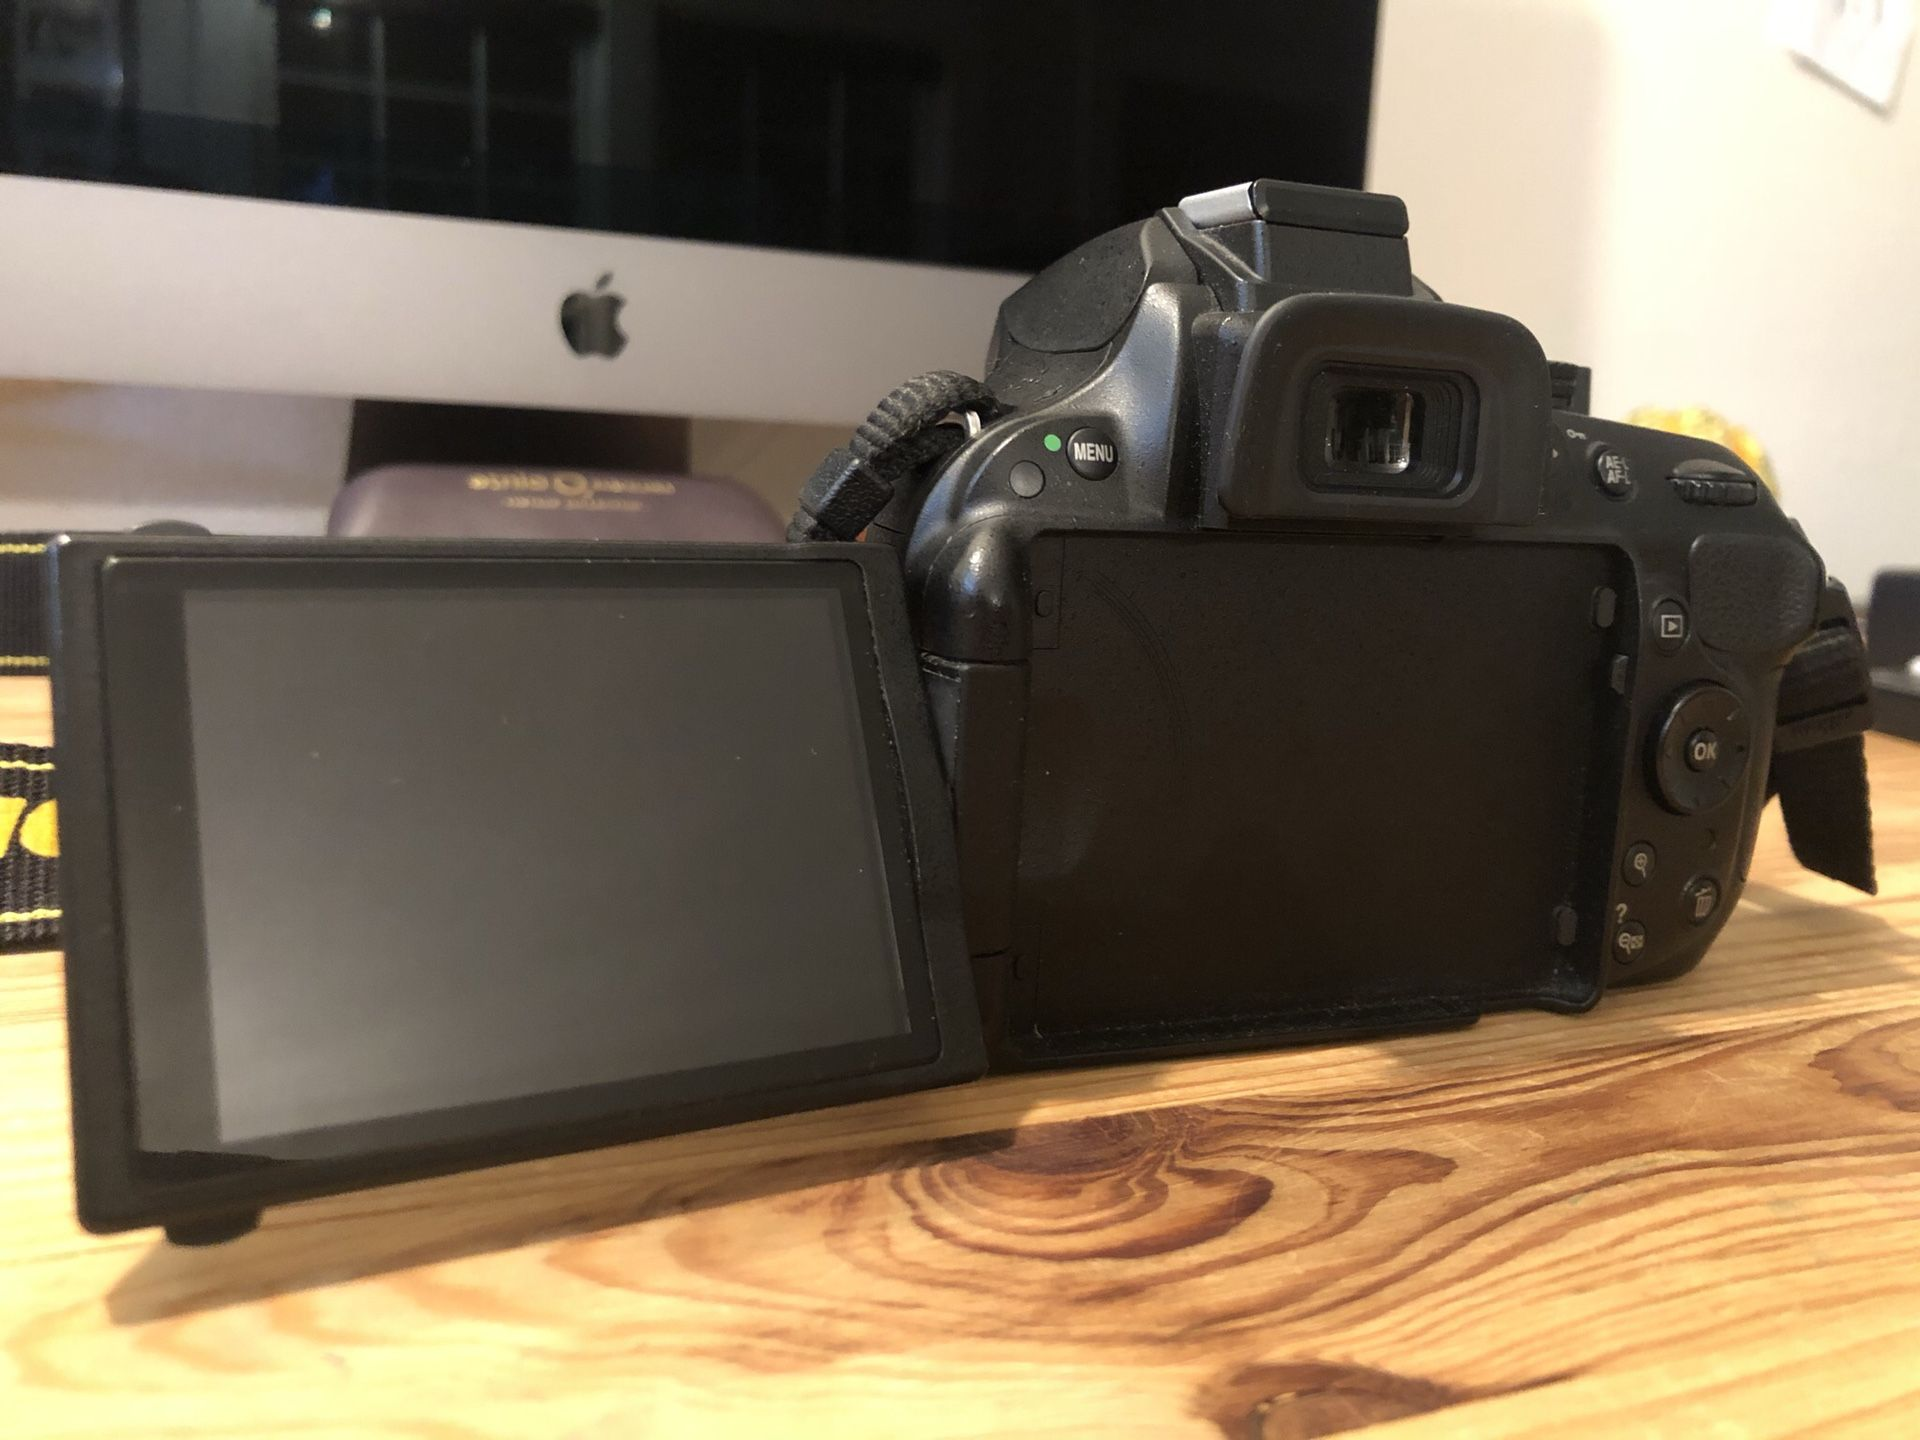 Nikon D5200 DSLR Camera Package